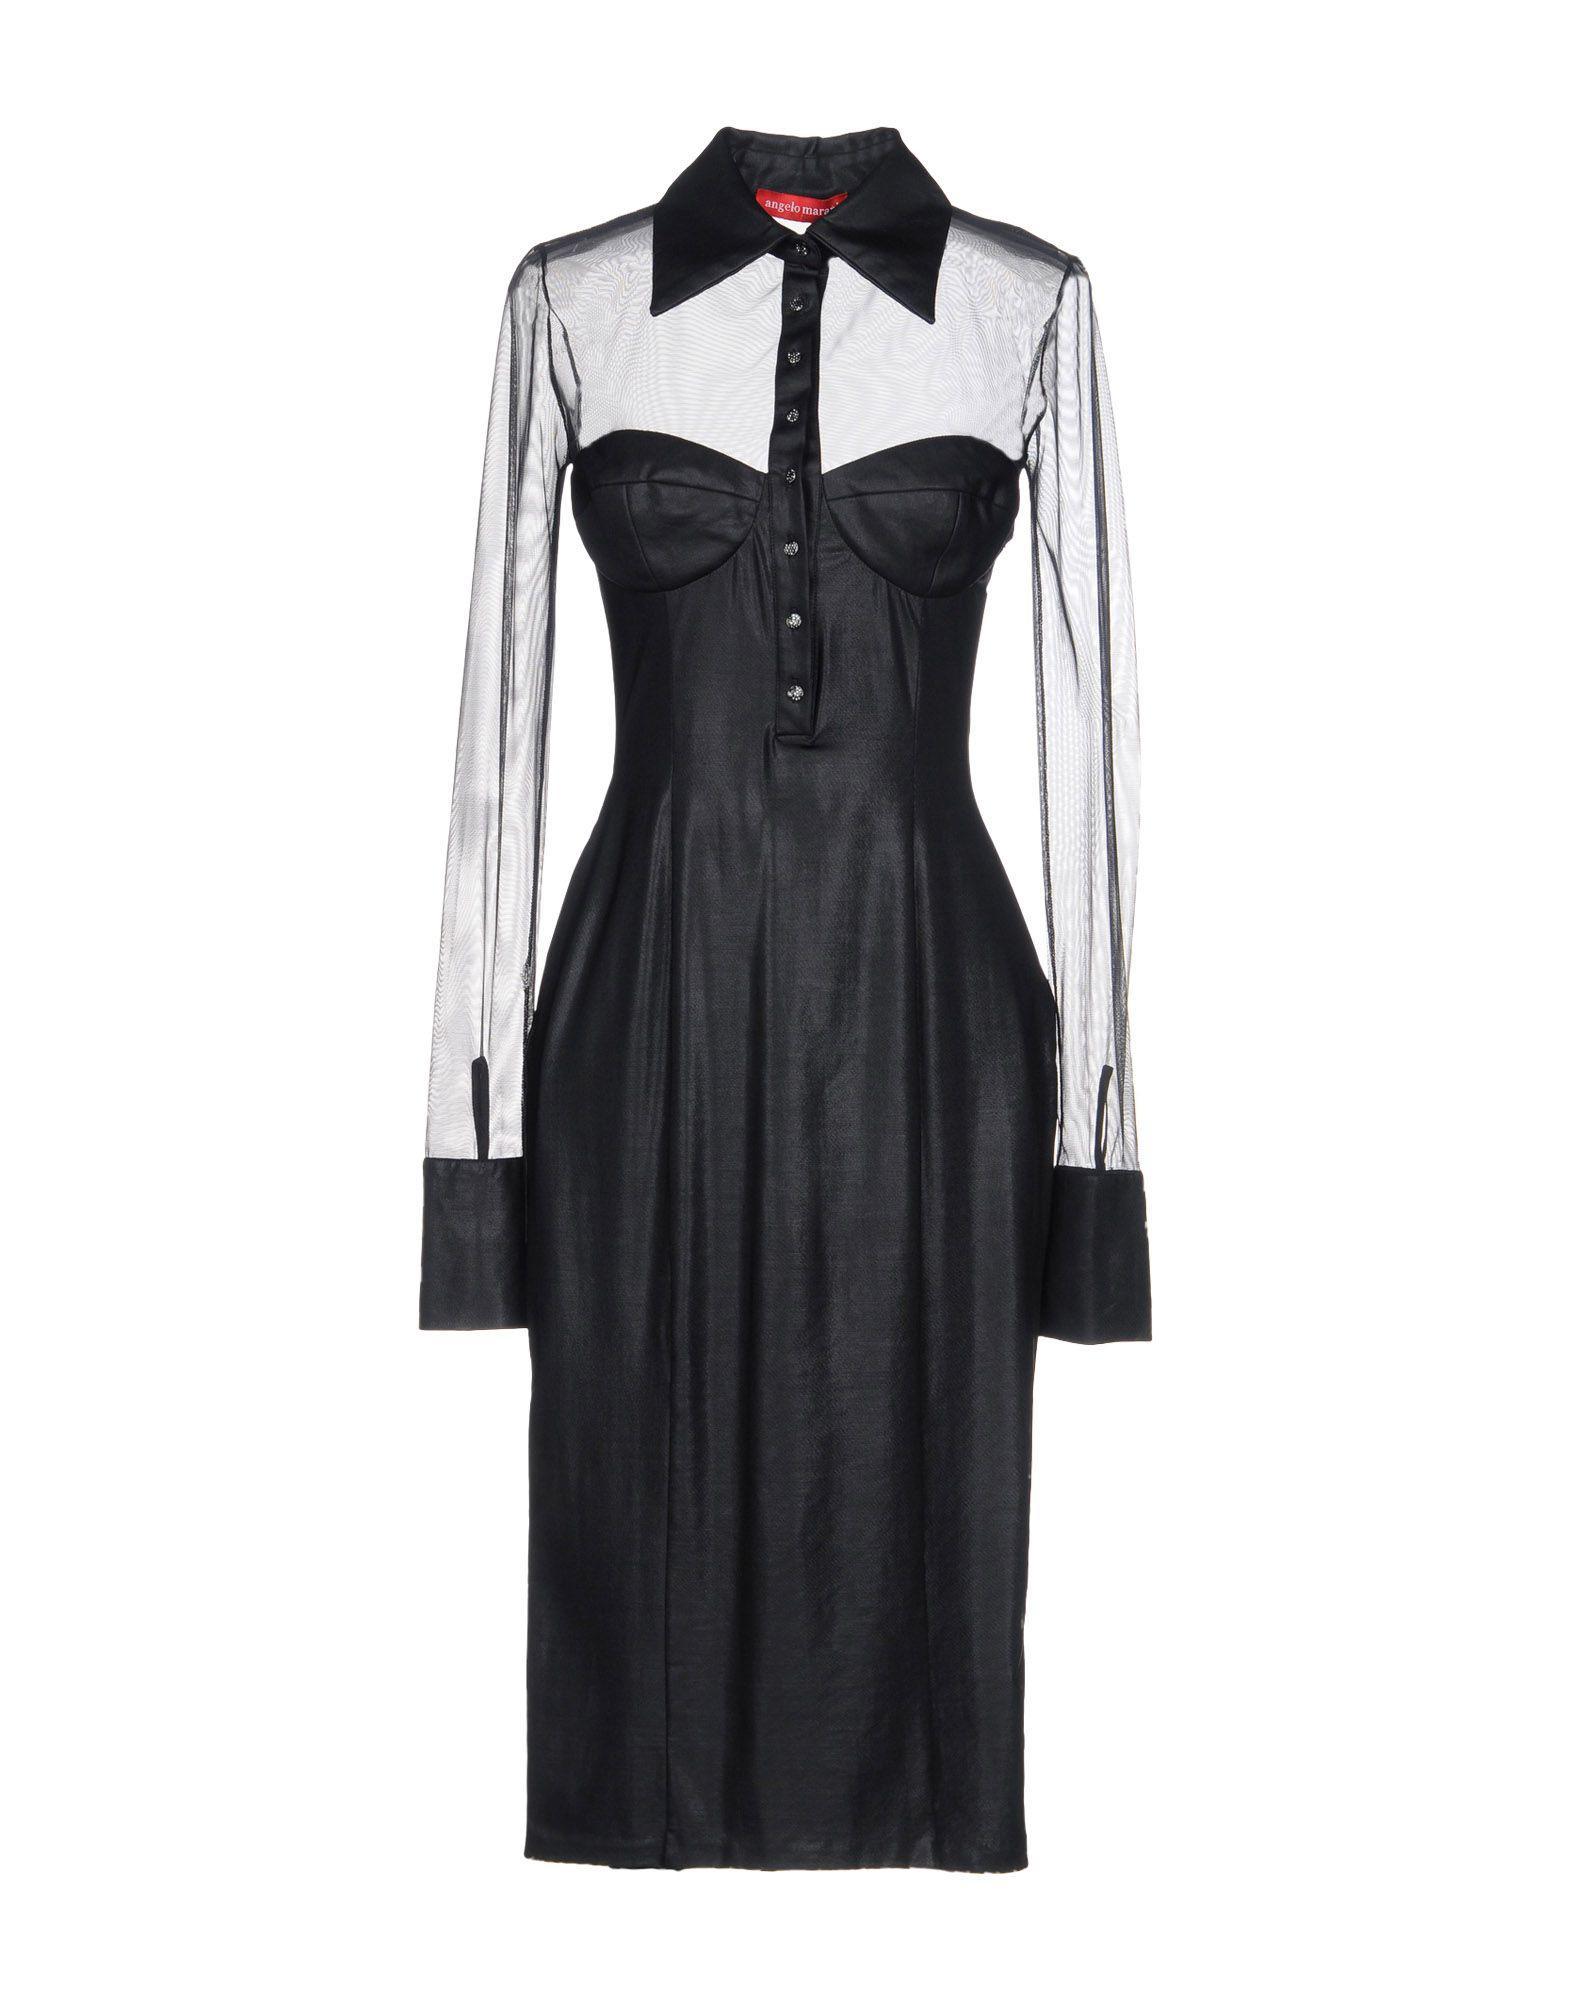 DRESSES - Knee-length dresses Marani WK8fq